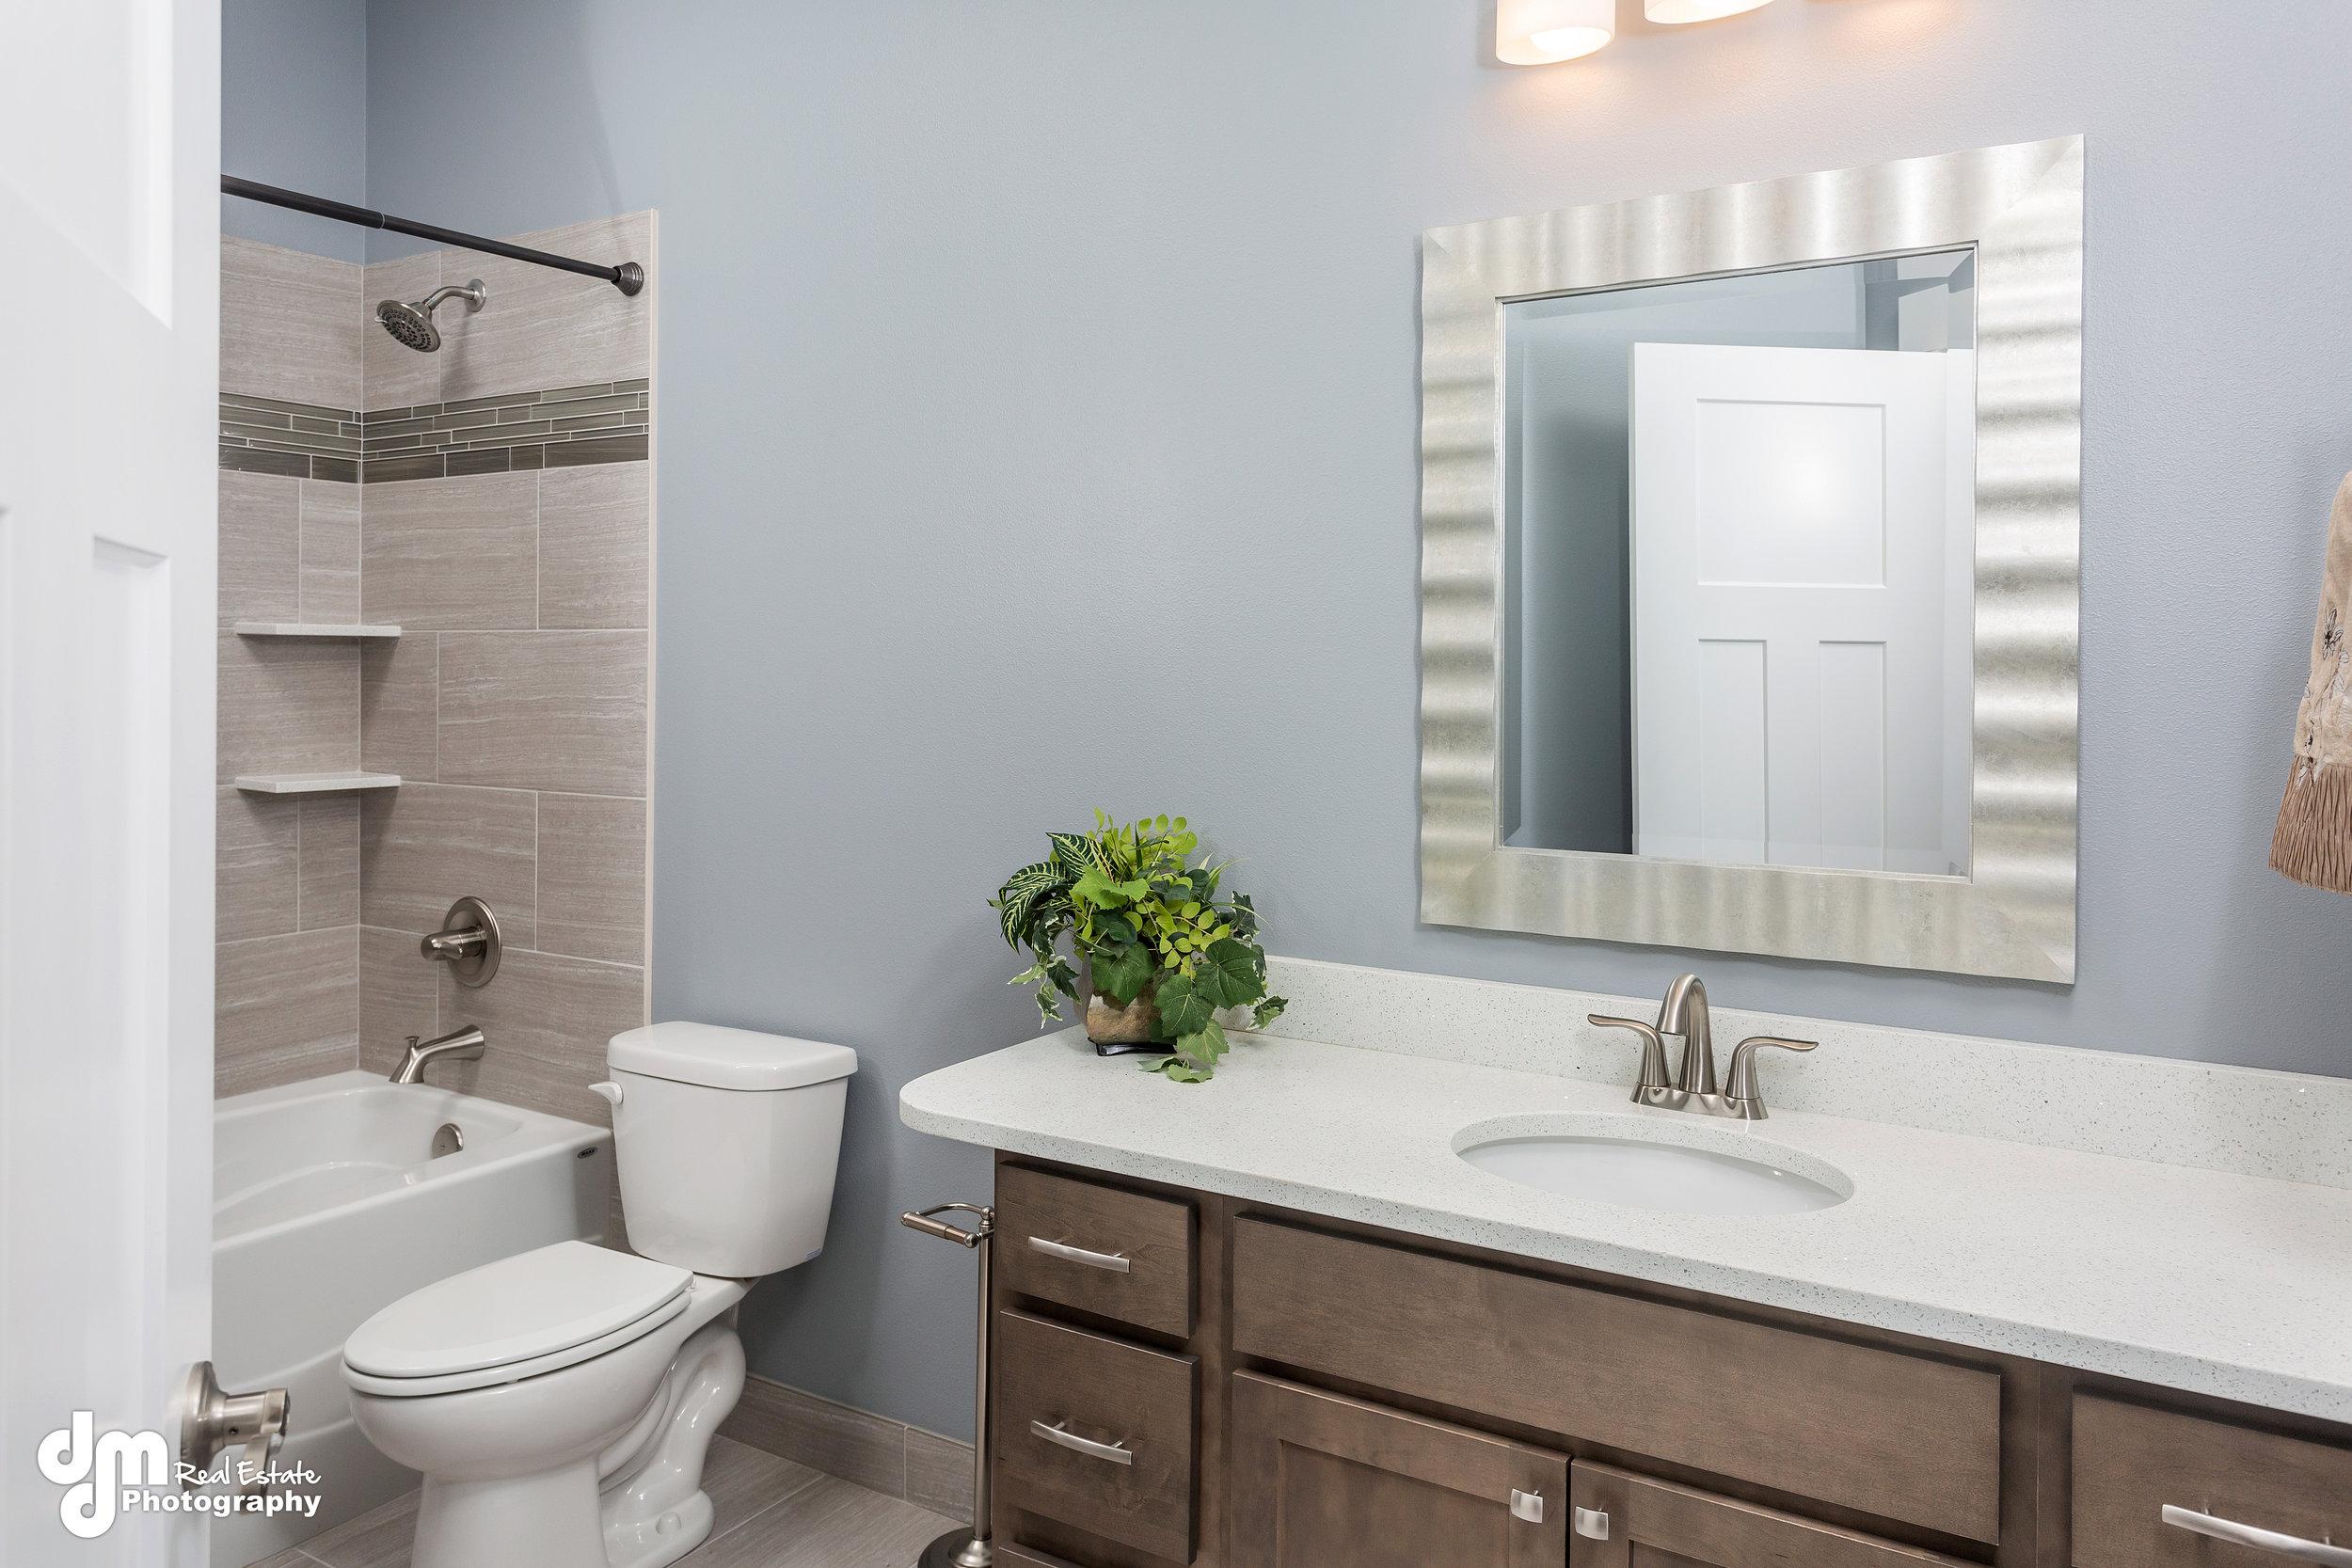 Bathroom_DMD_9115.jpg